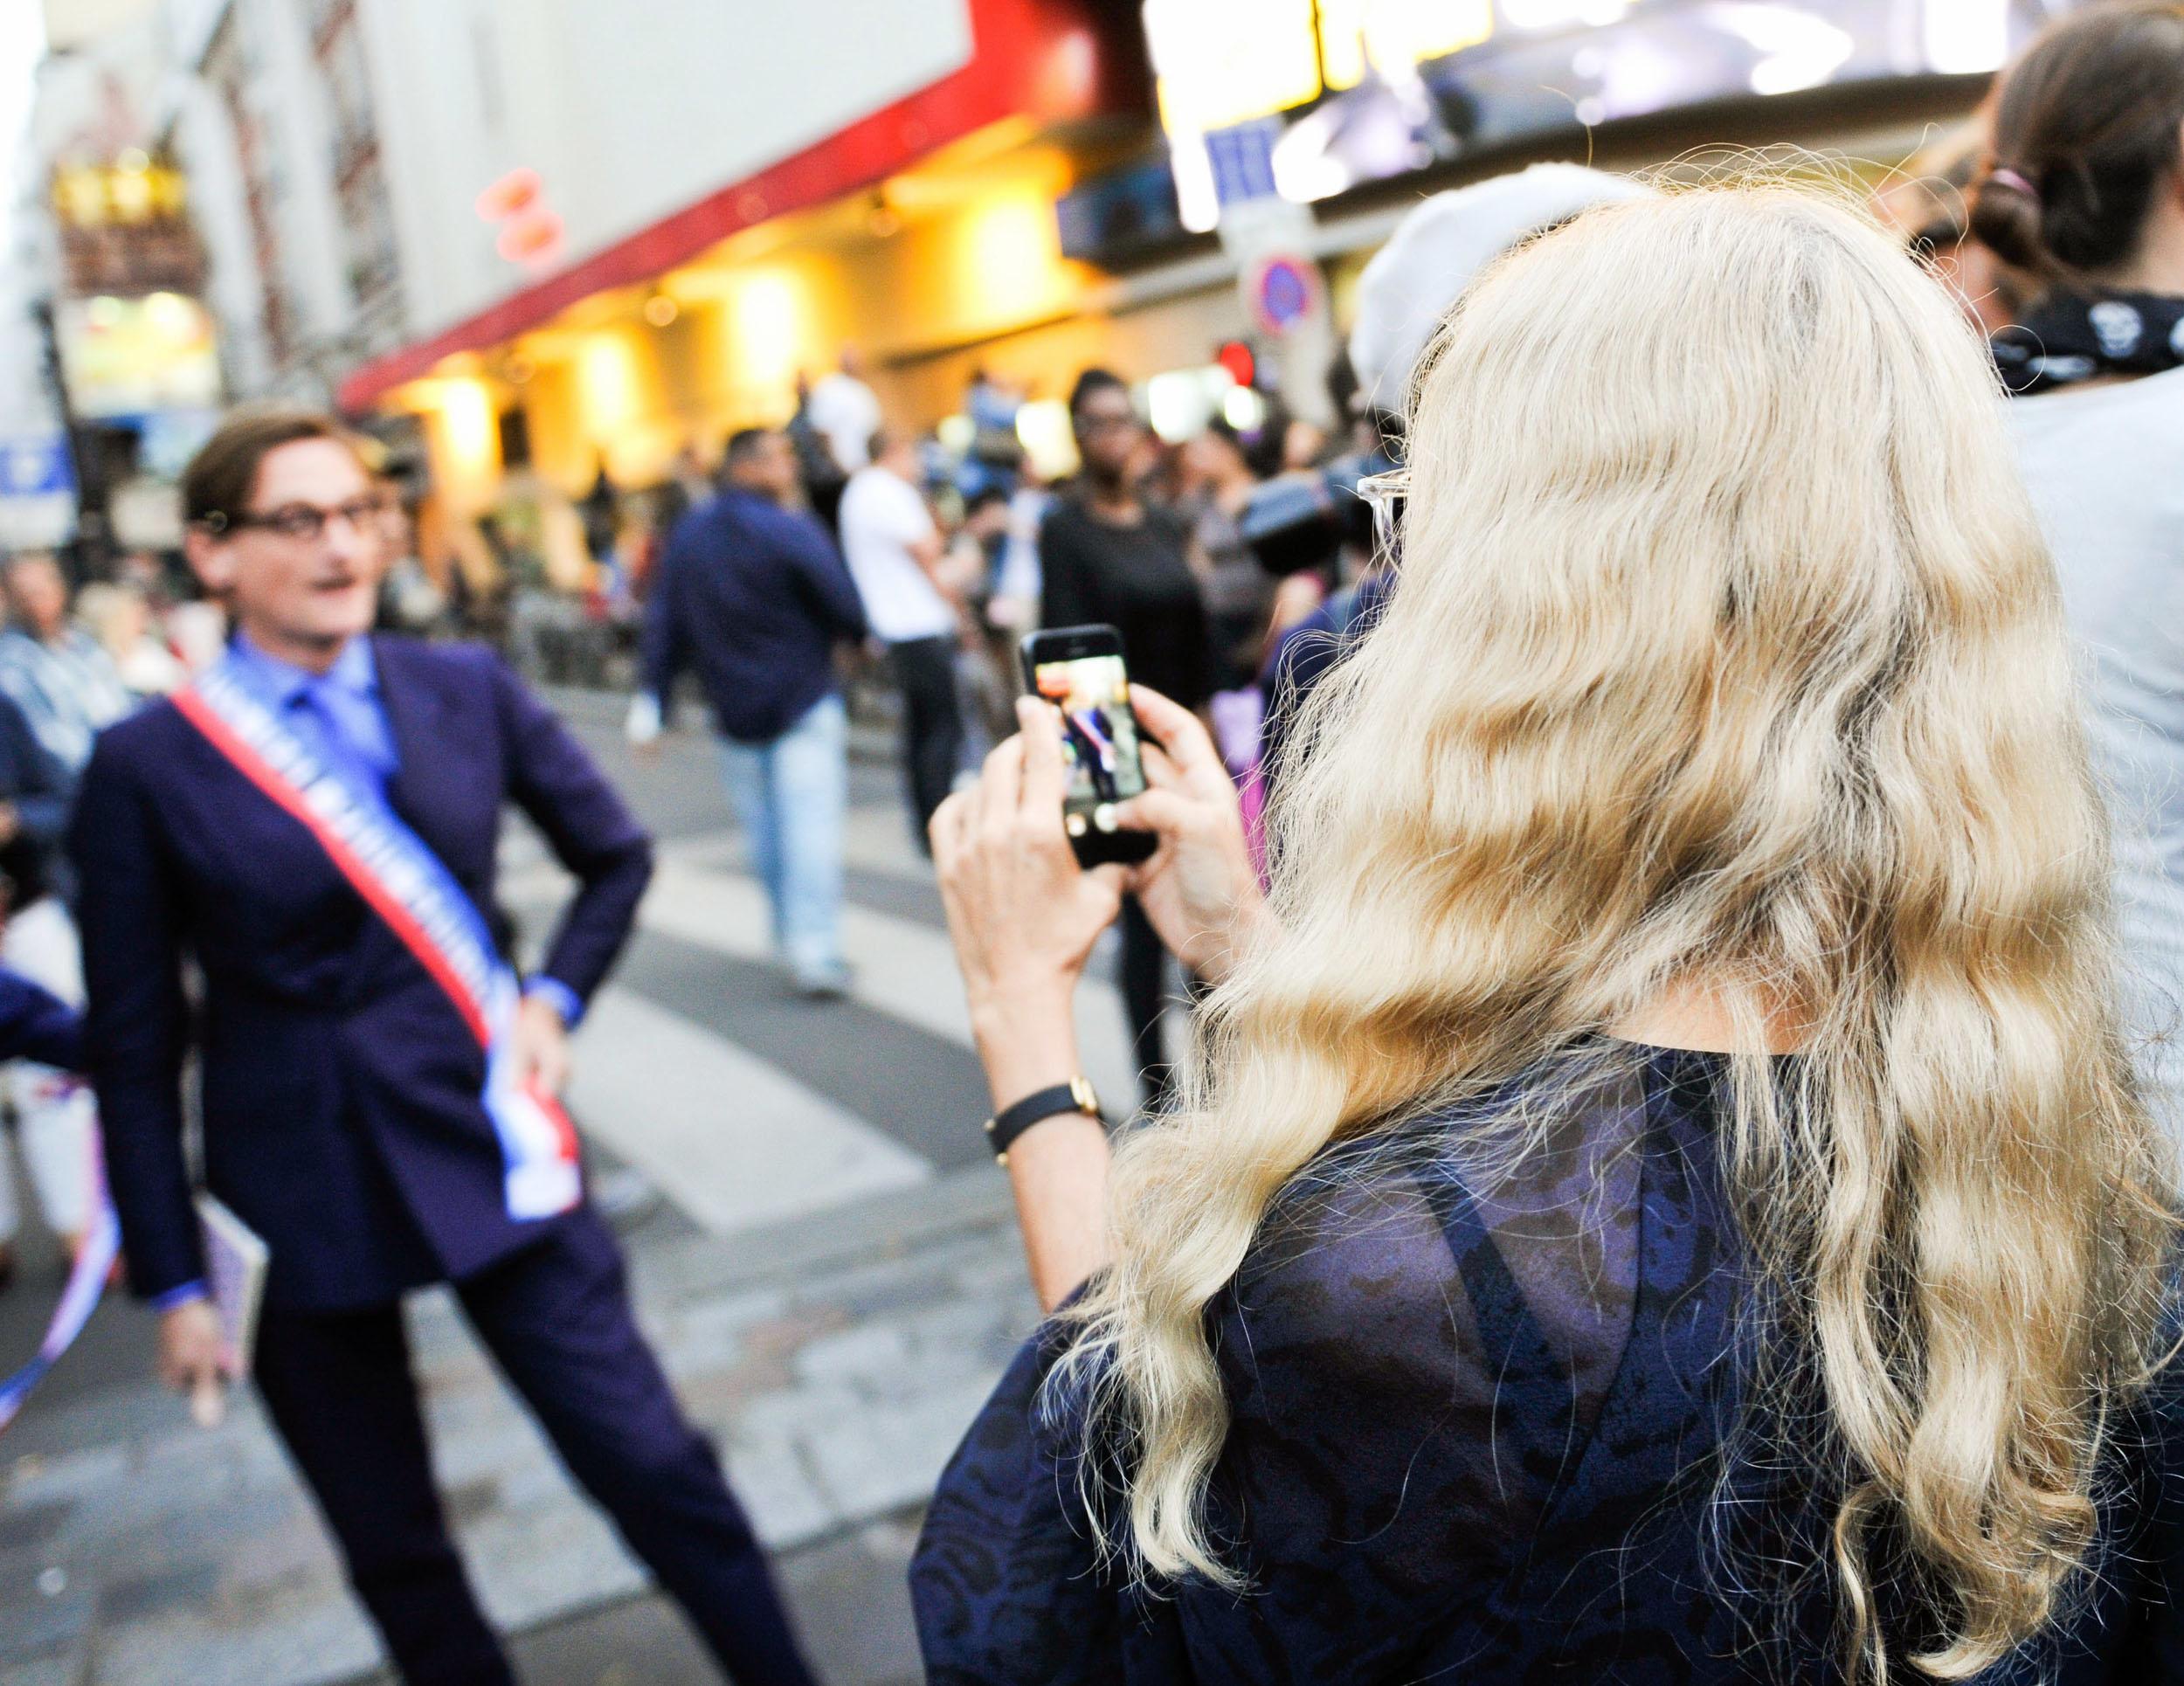 StreetStyle_ParisFashionWeek_LeandroJusten_130.jpg